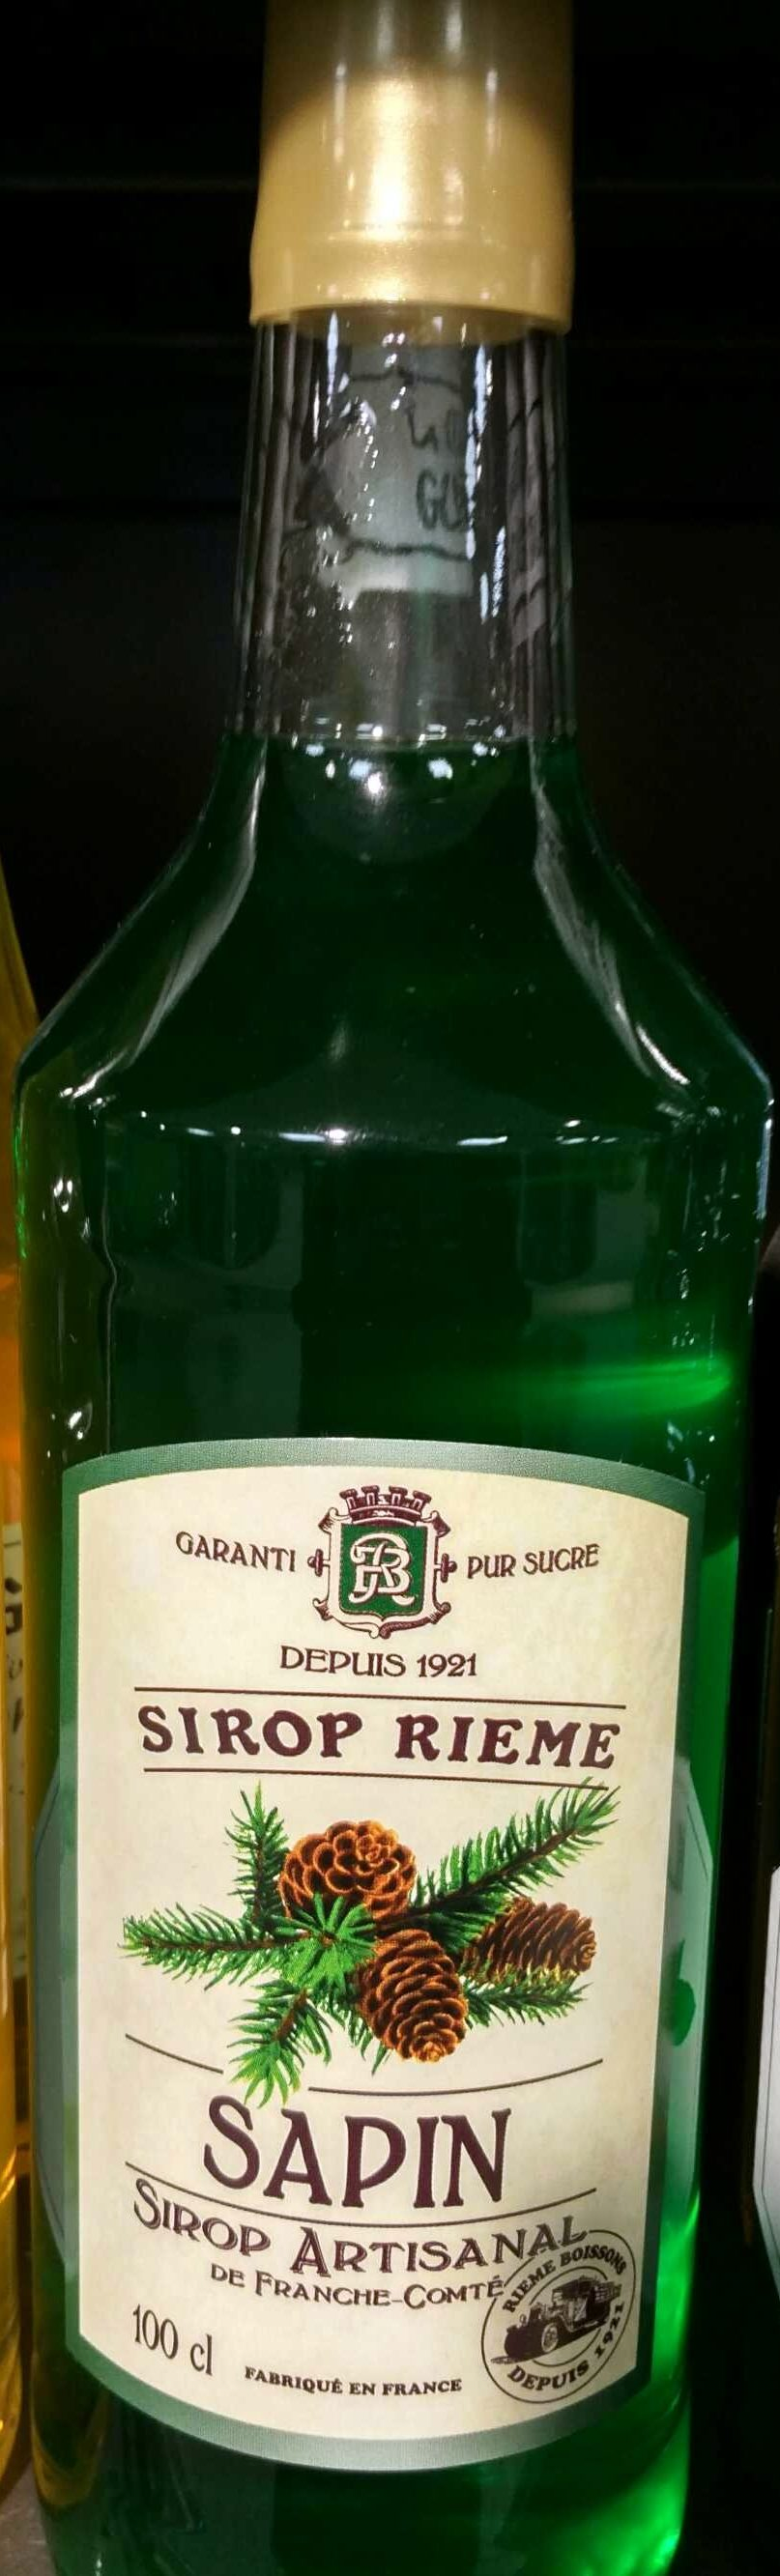 Sirop de sapin, garanti pur sucre, la bouteille de - 製品 - fr